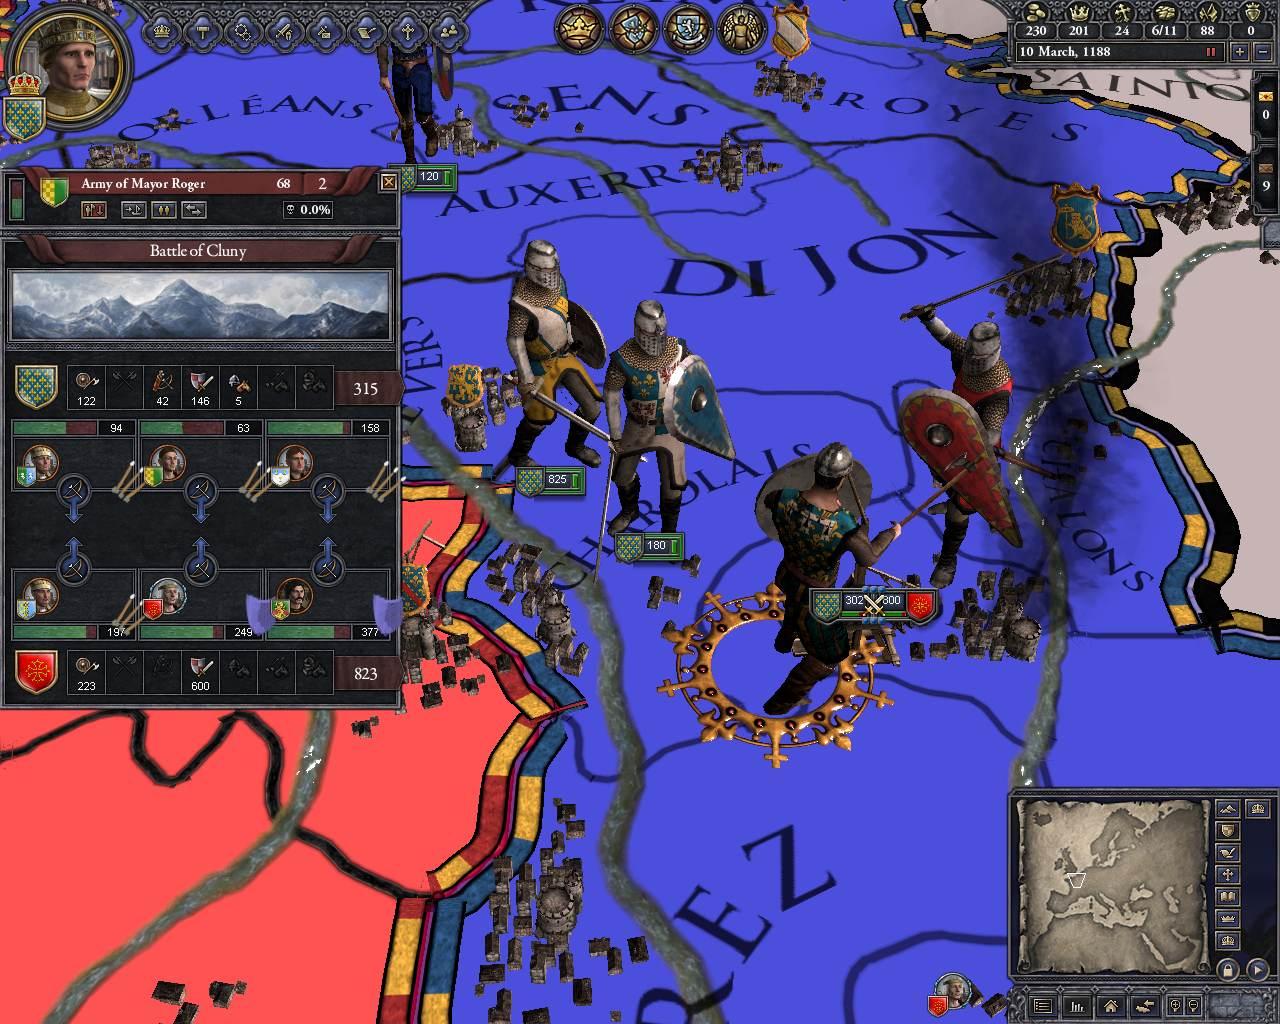 Crusader Kings 2 | A Man of Moderate Words